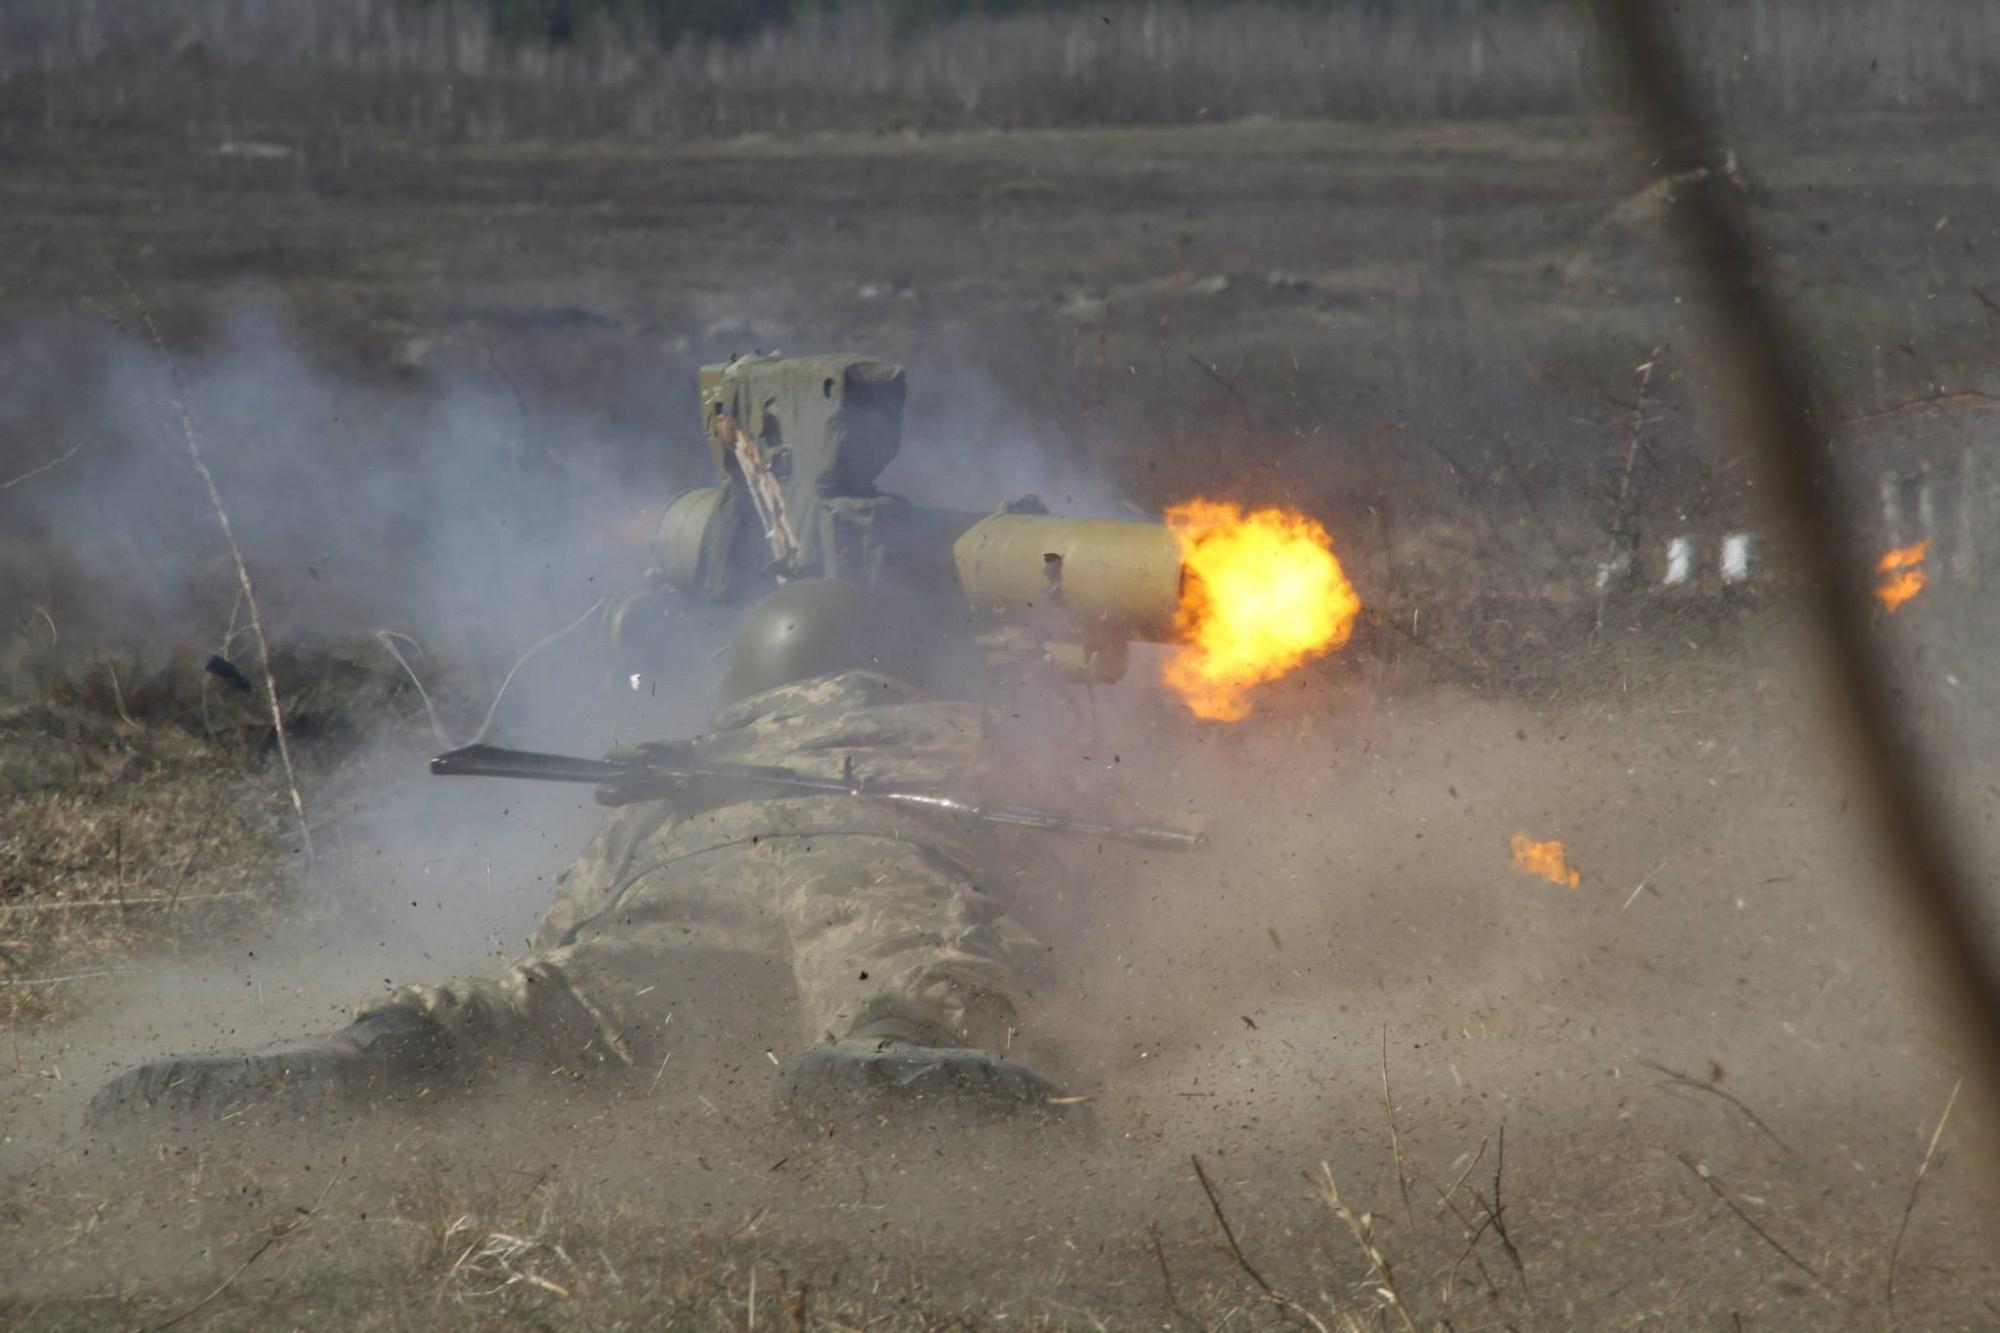 Украинские силовики обстреляли территорию ЛНР